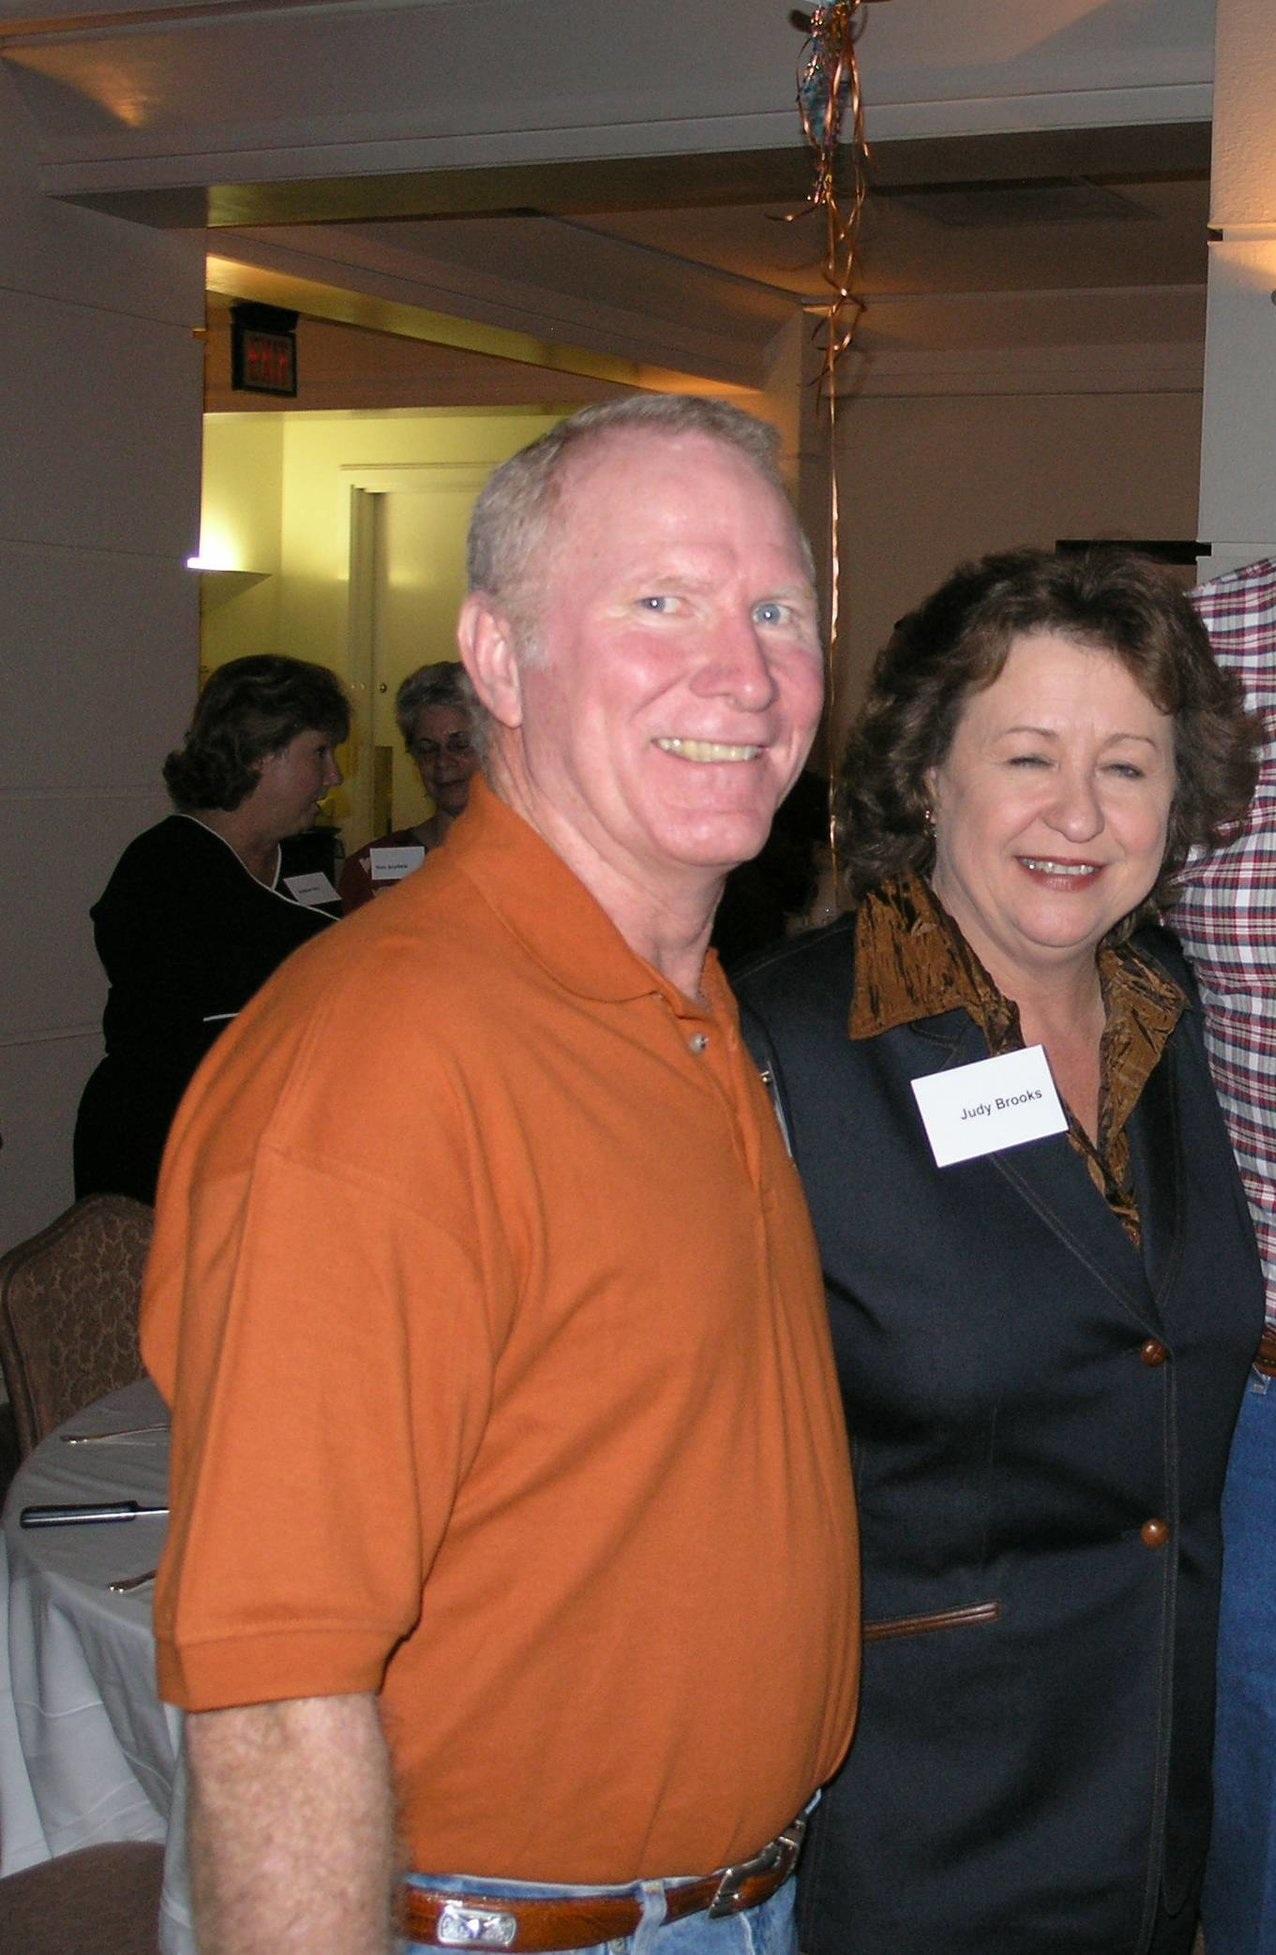 Donnie Wiggington and Judy Brooks